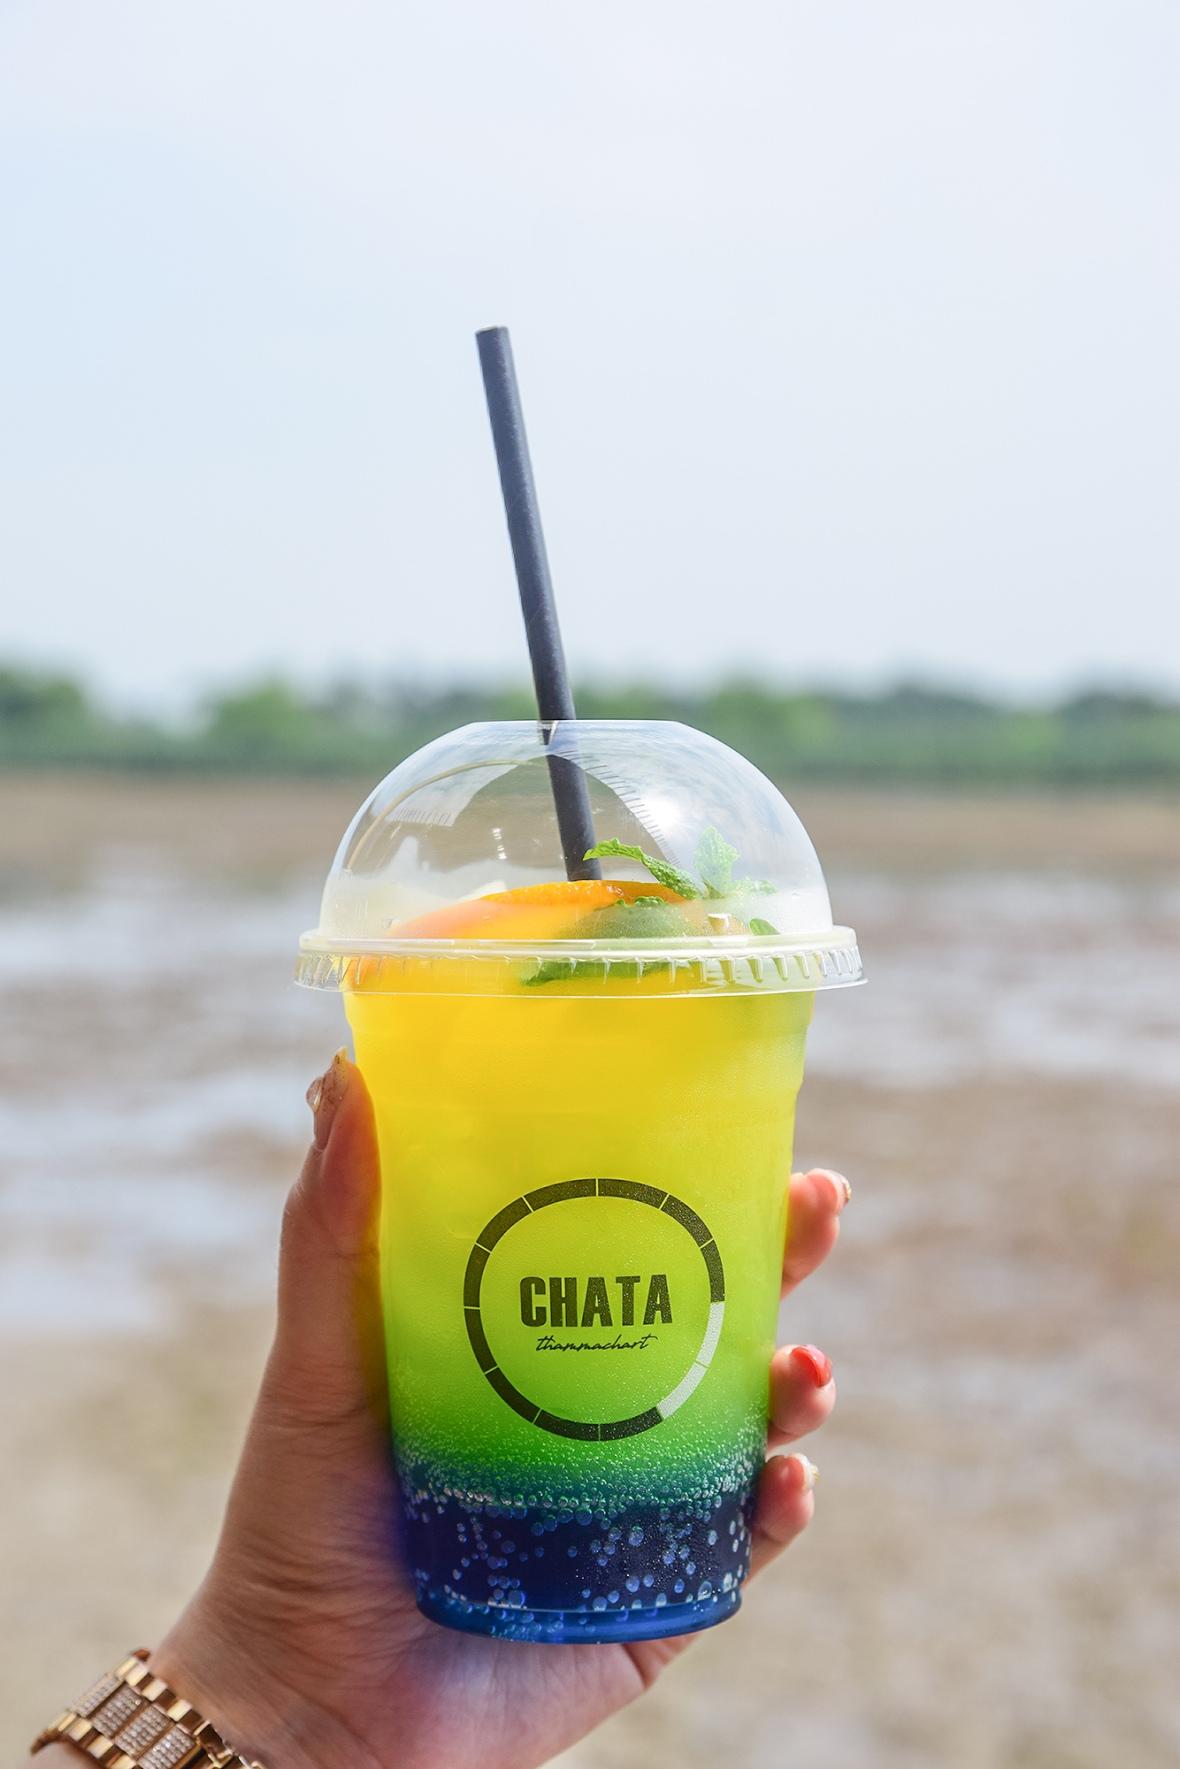 Chata thammachart Cafe&Bistro (31)